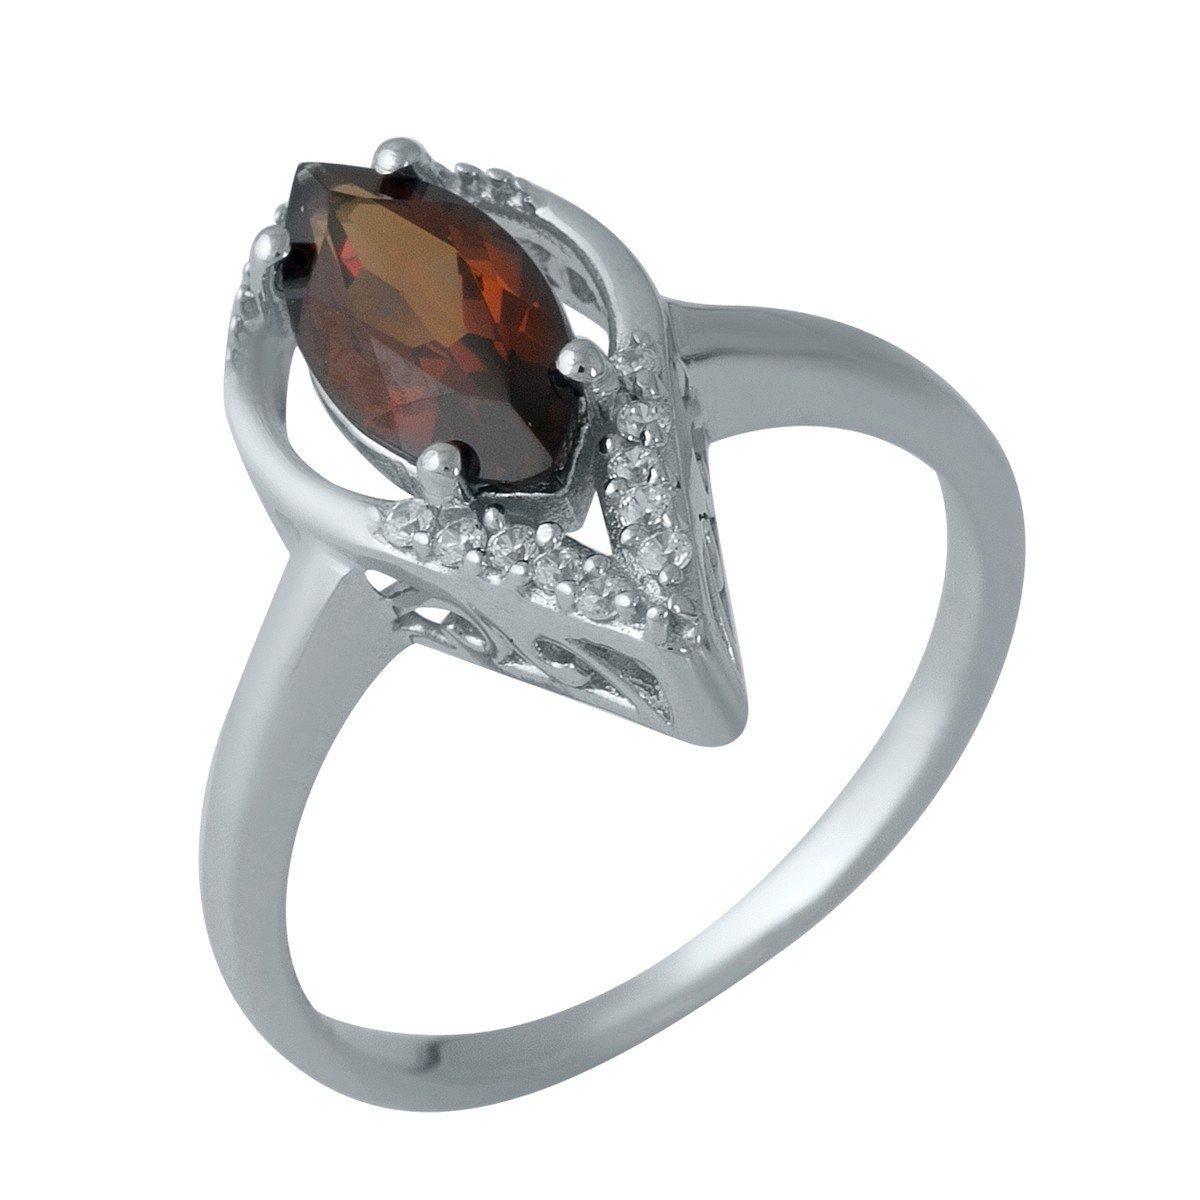 Серебряное кольцо DreamJewelry с натуральным гранатом (1987551) 18.5 размер